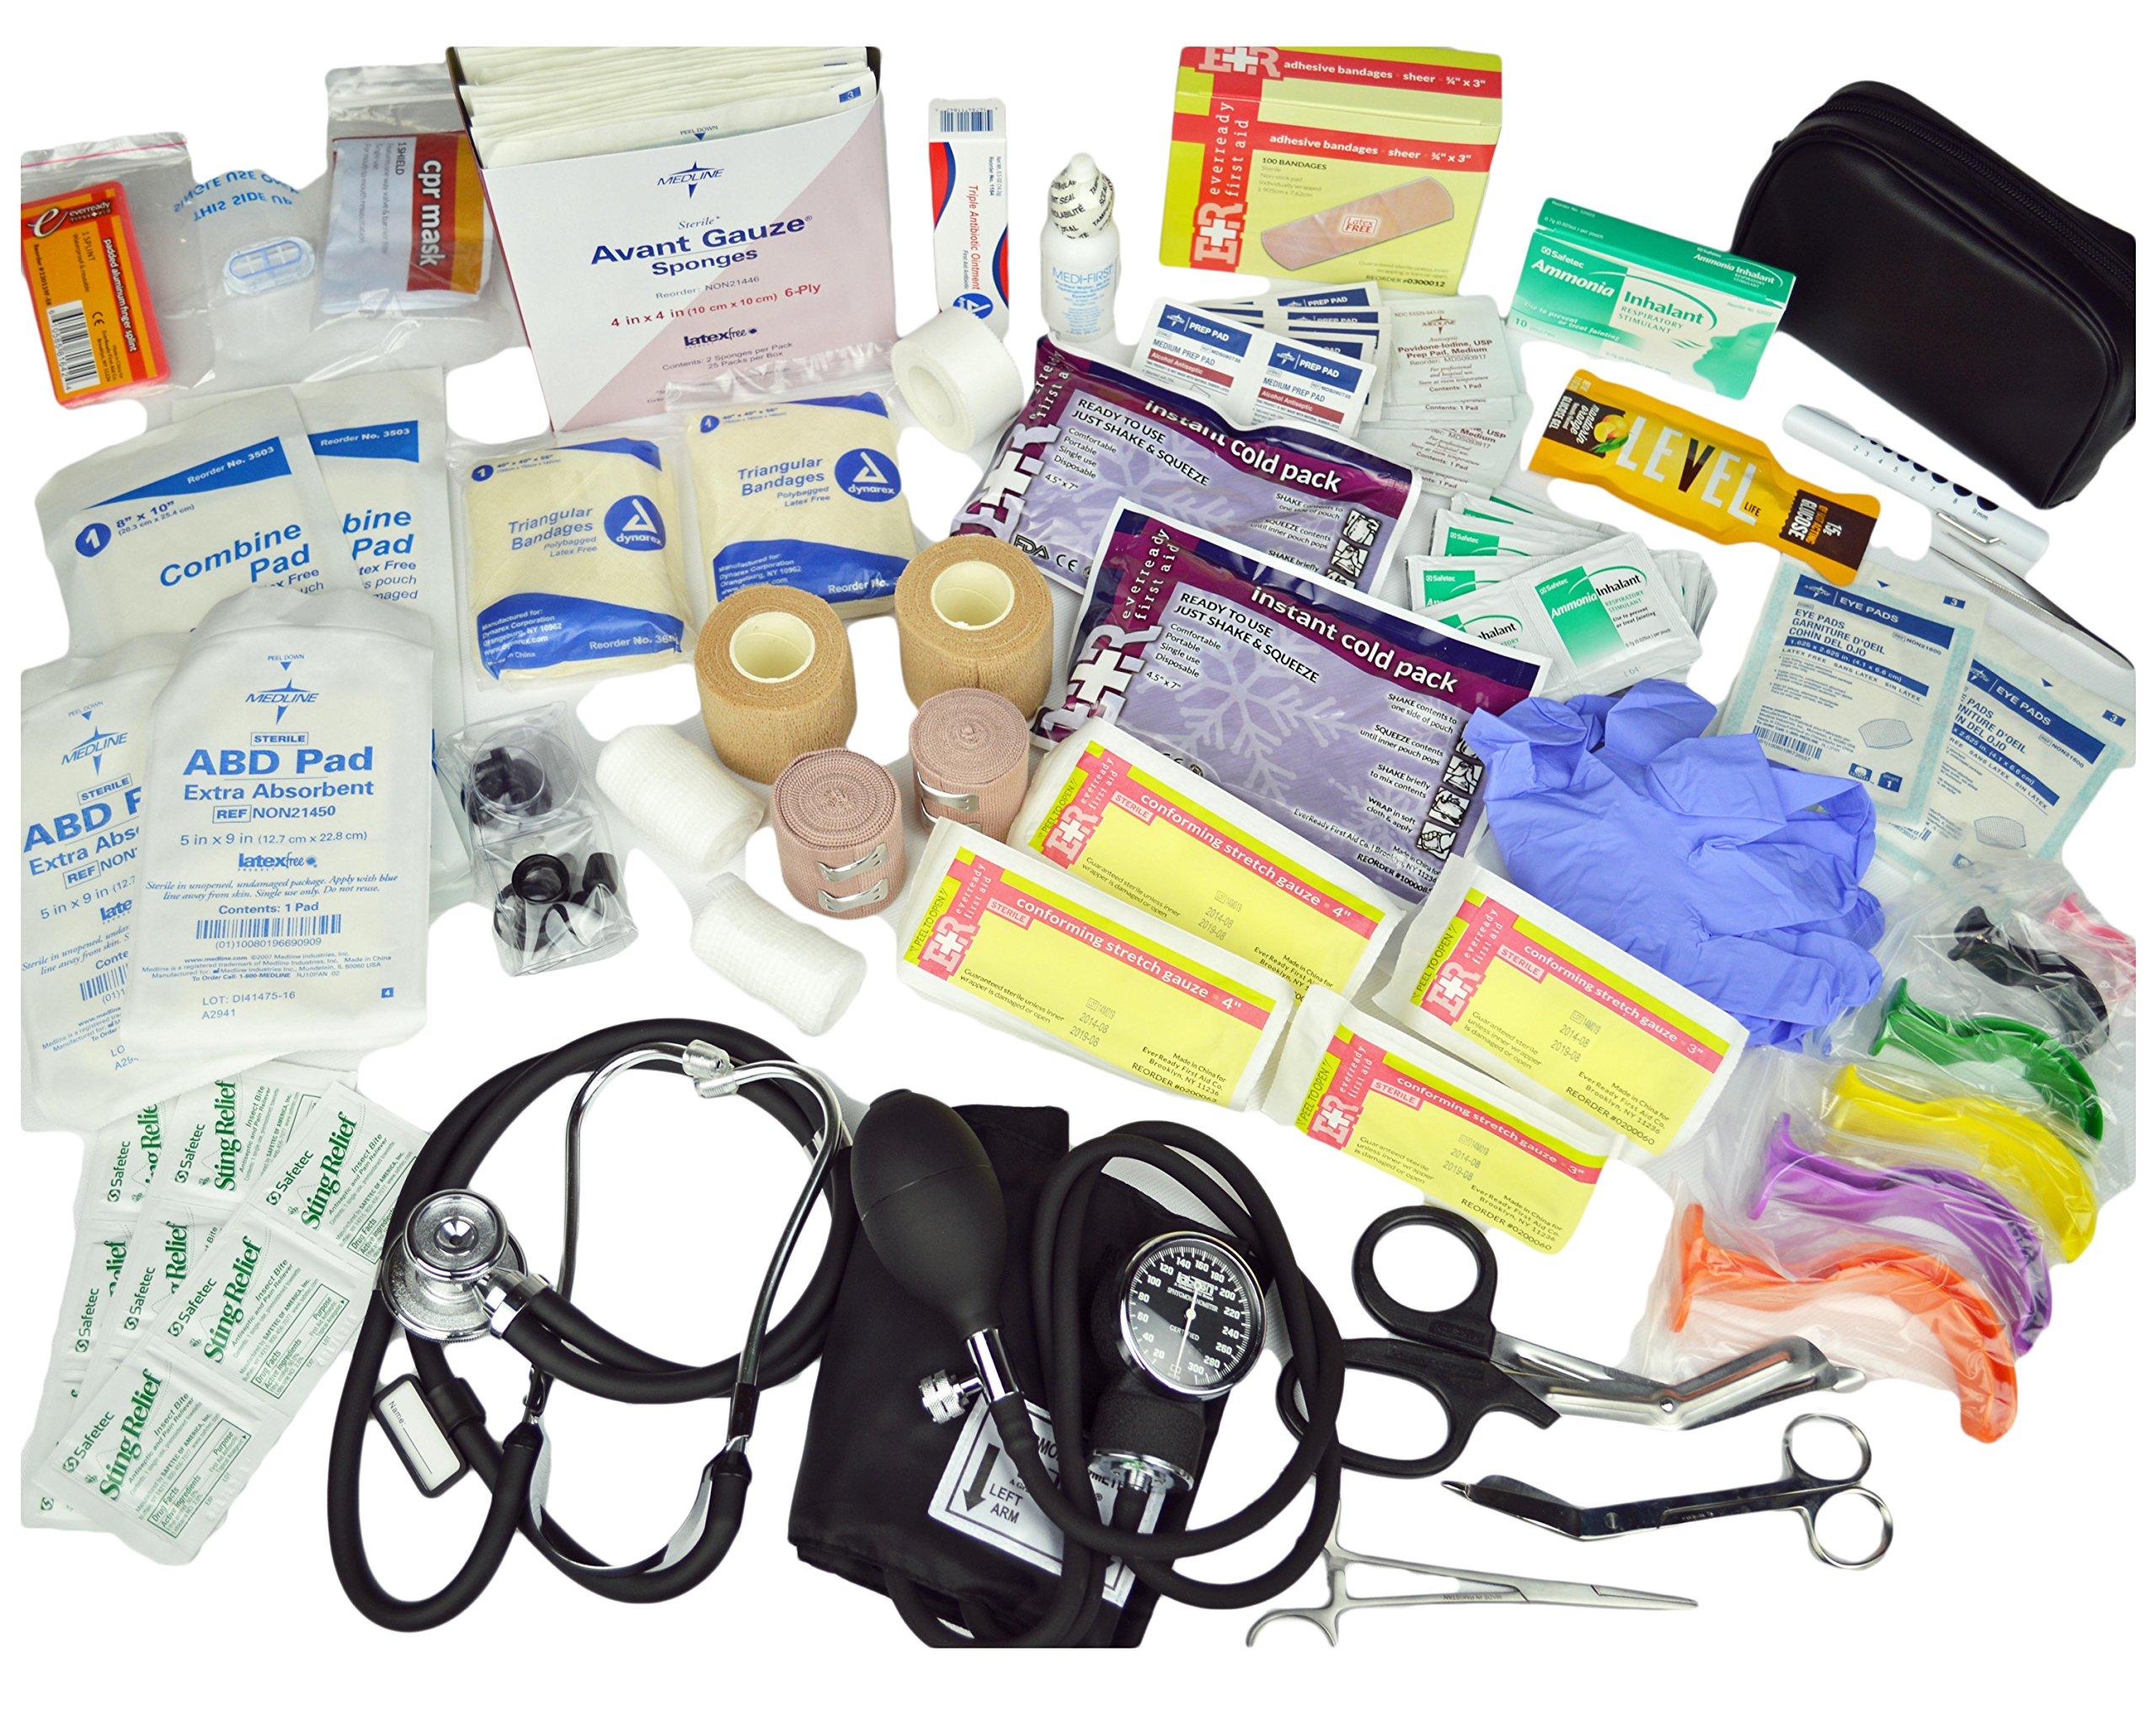 Lightning X Value Compact Medic First Responder EMS/EMT Stocked Trauma Bag w/Standard Fill Kit B - Orange by Lightning X Products (Image #5)